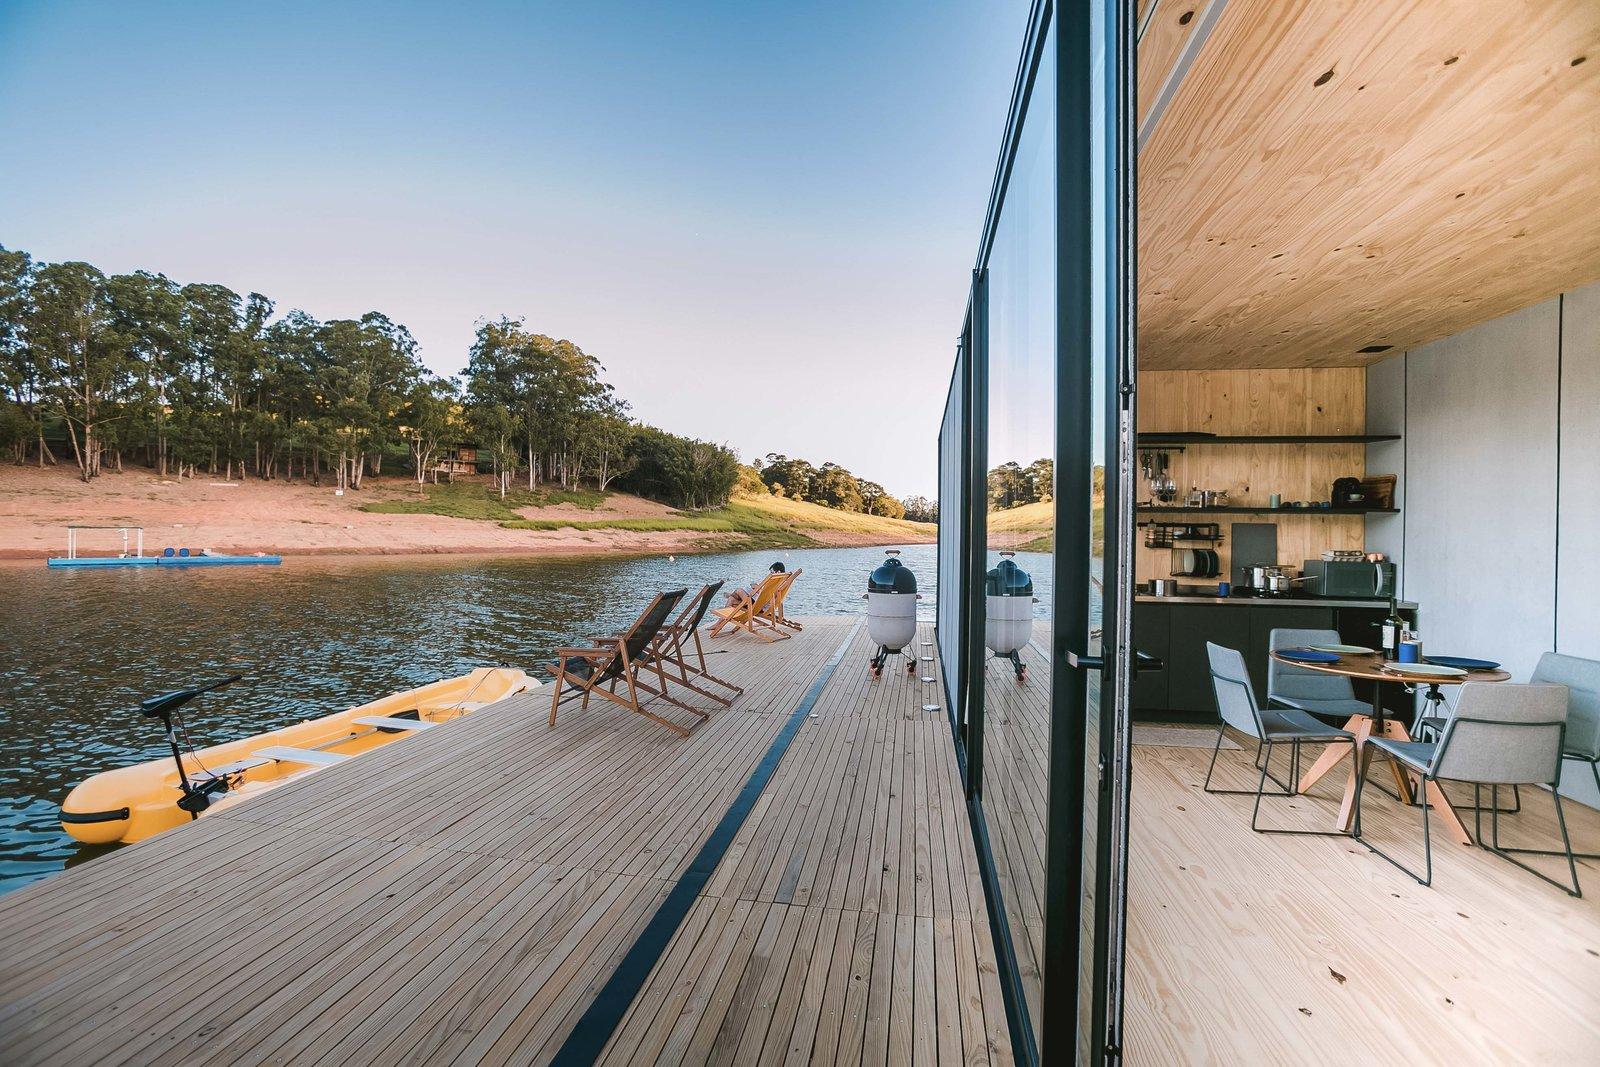 WaterlilliHaus deck